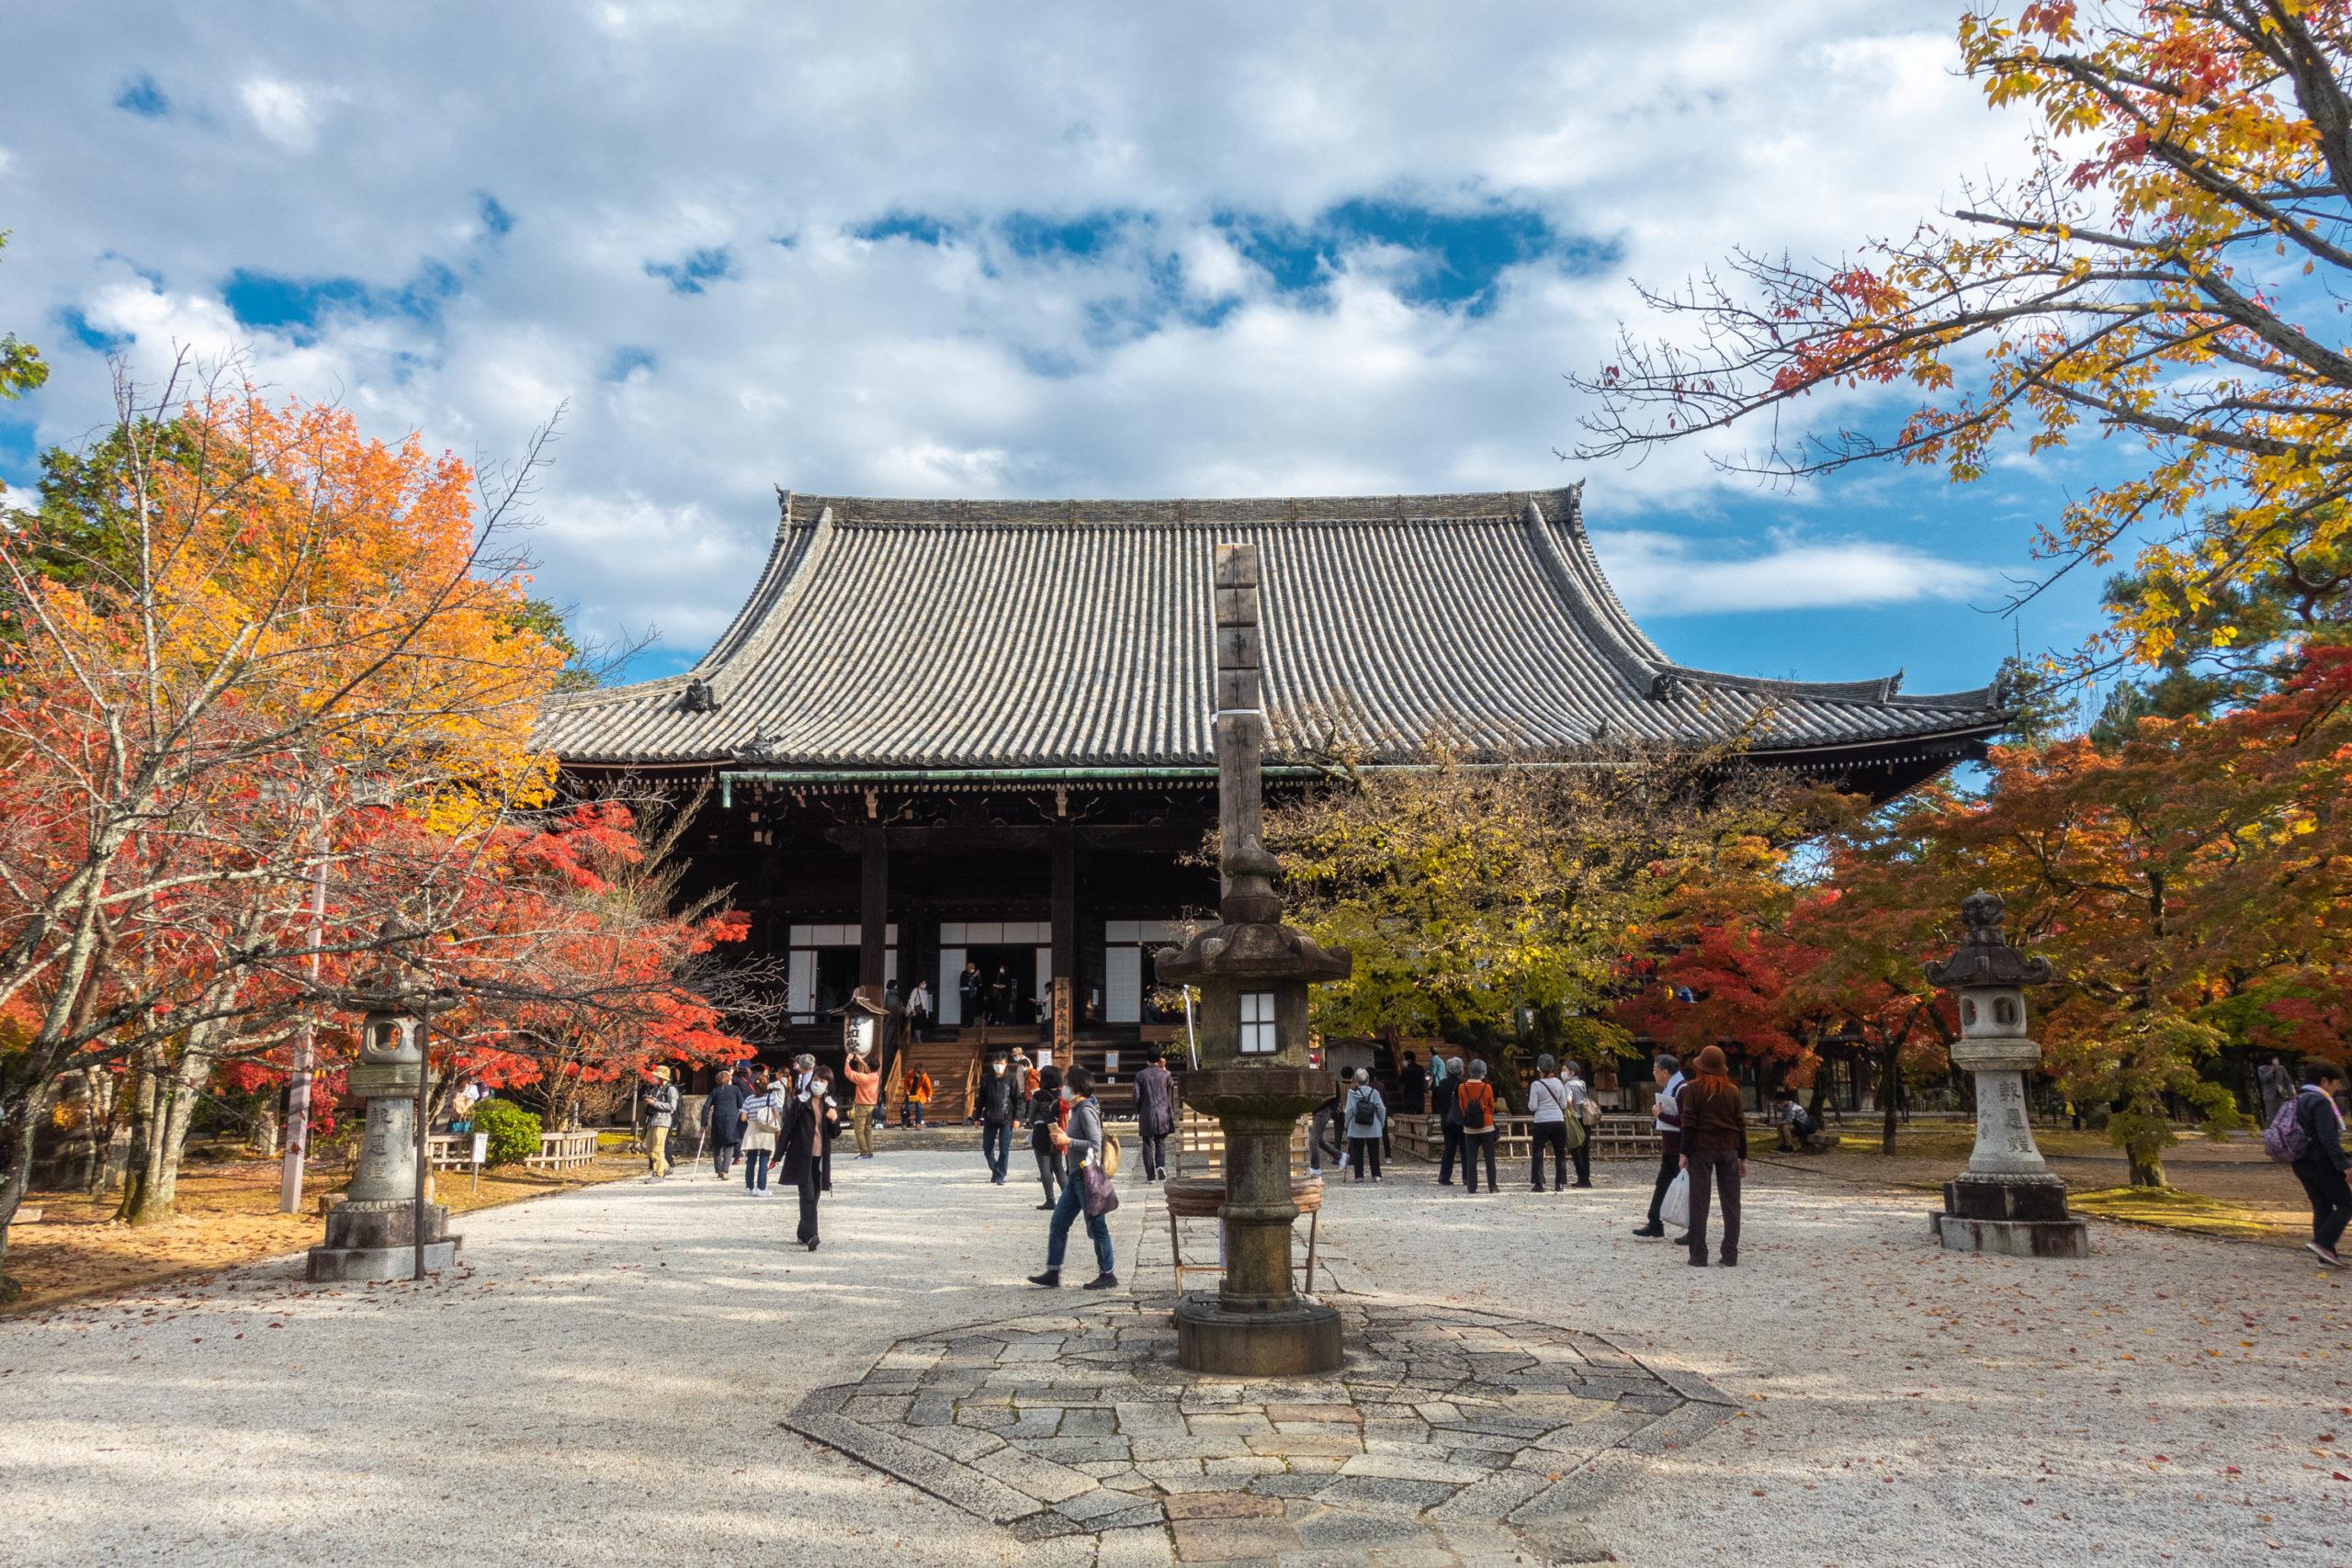 DSC00787-scaled 京都  真如堂(三重塔と紅葉の風情を感じる景色が美しい秋におすすめのスポット!撮影した写真の紹介、アクセス情報など)